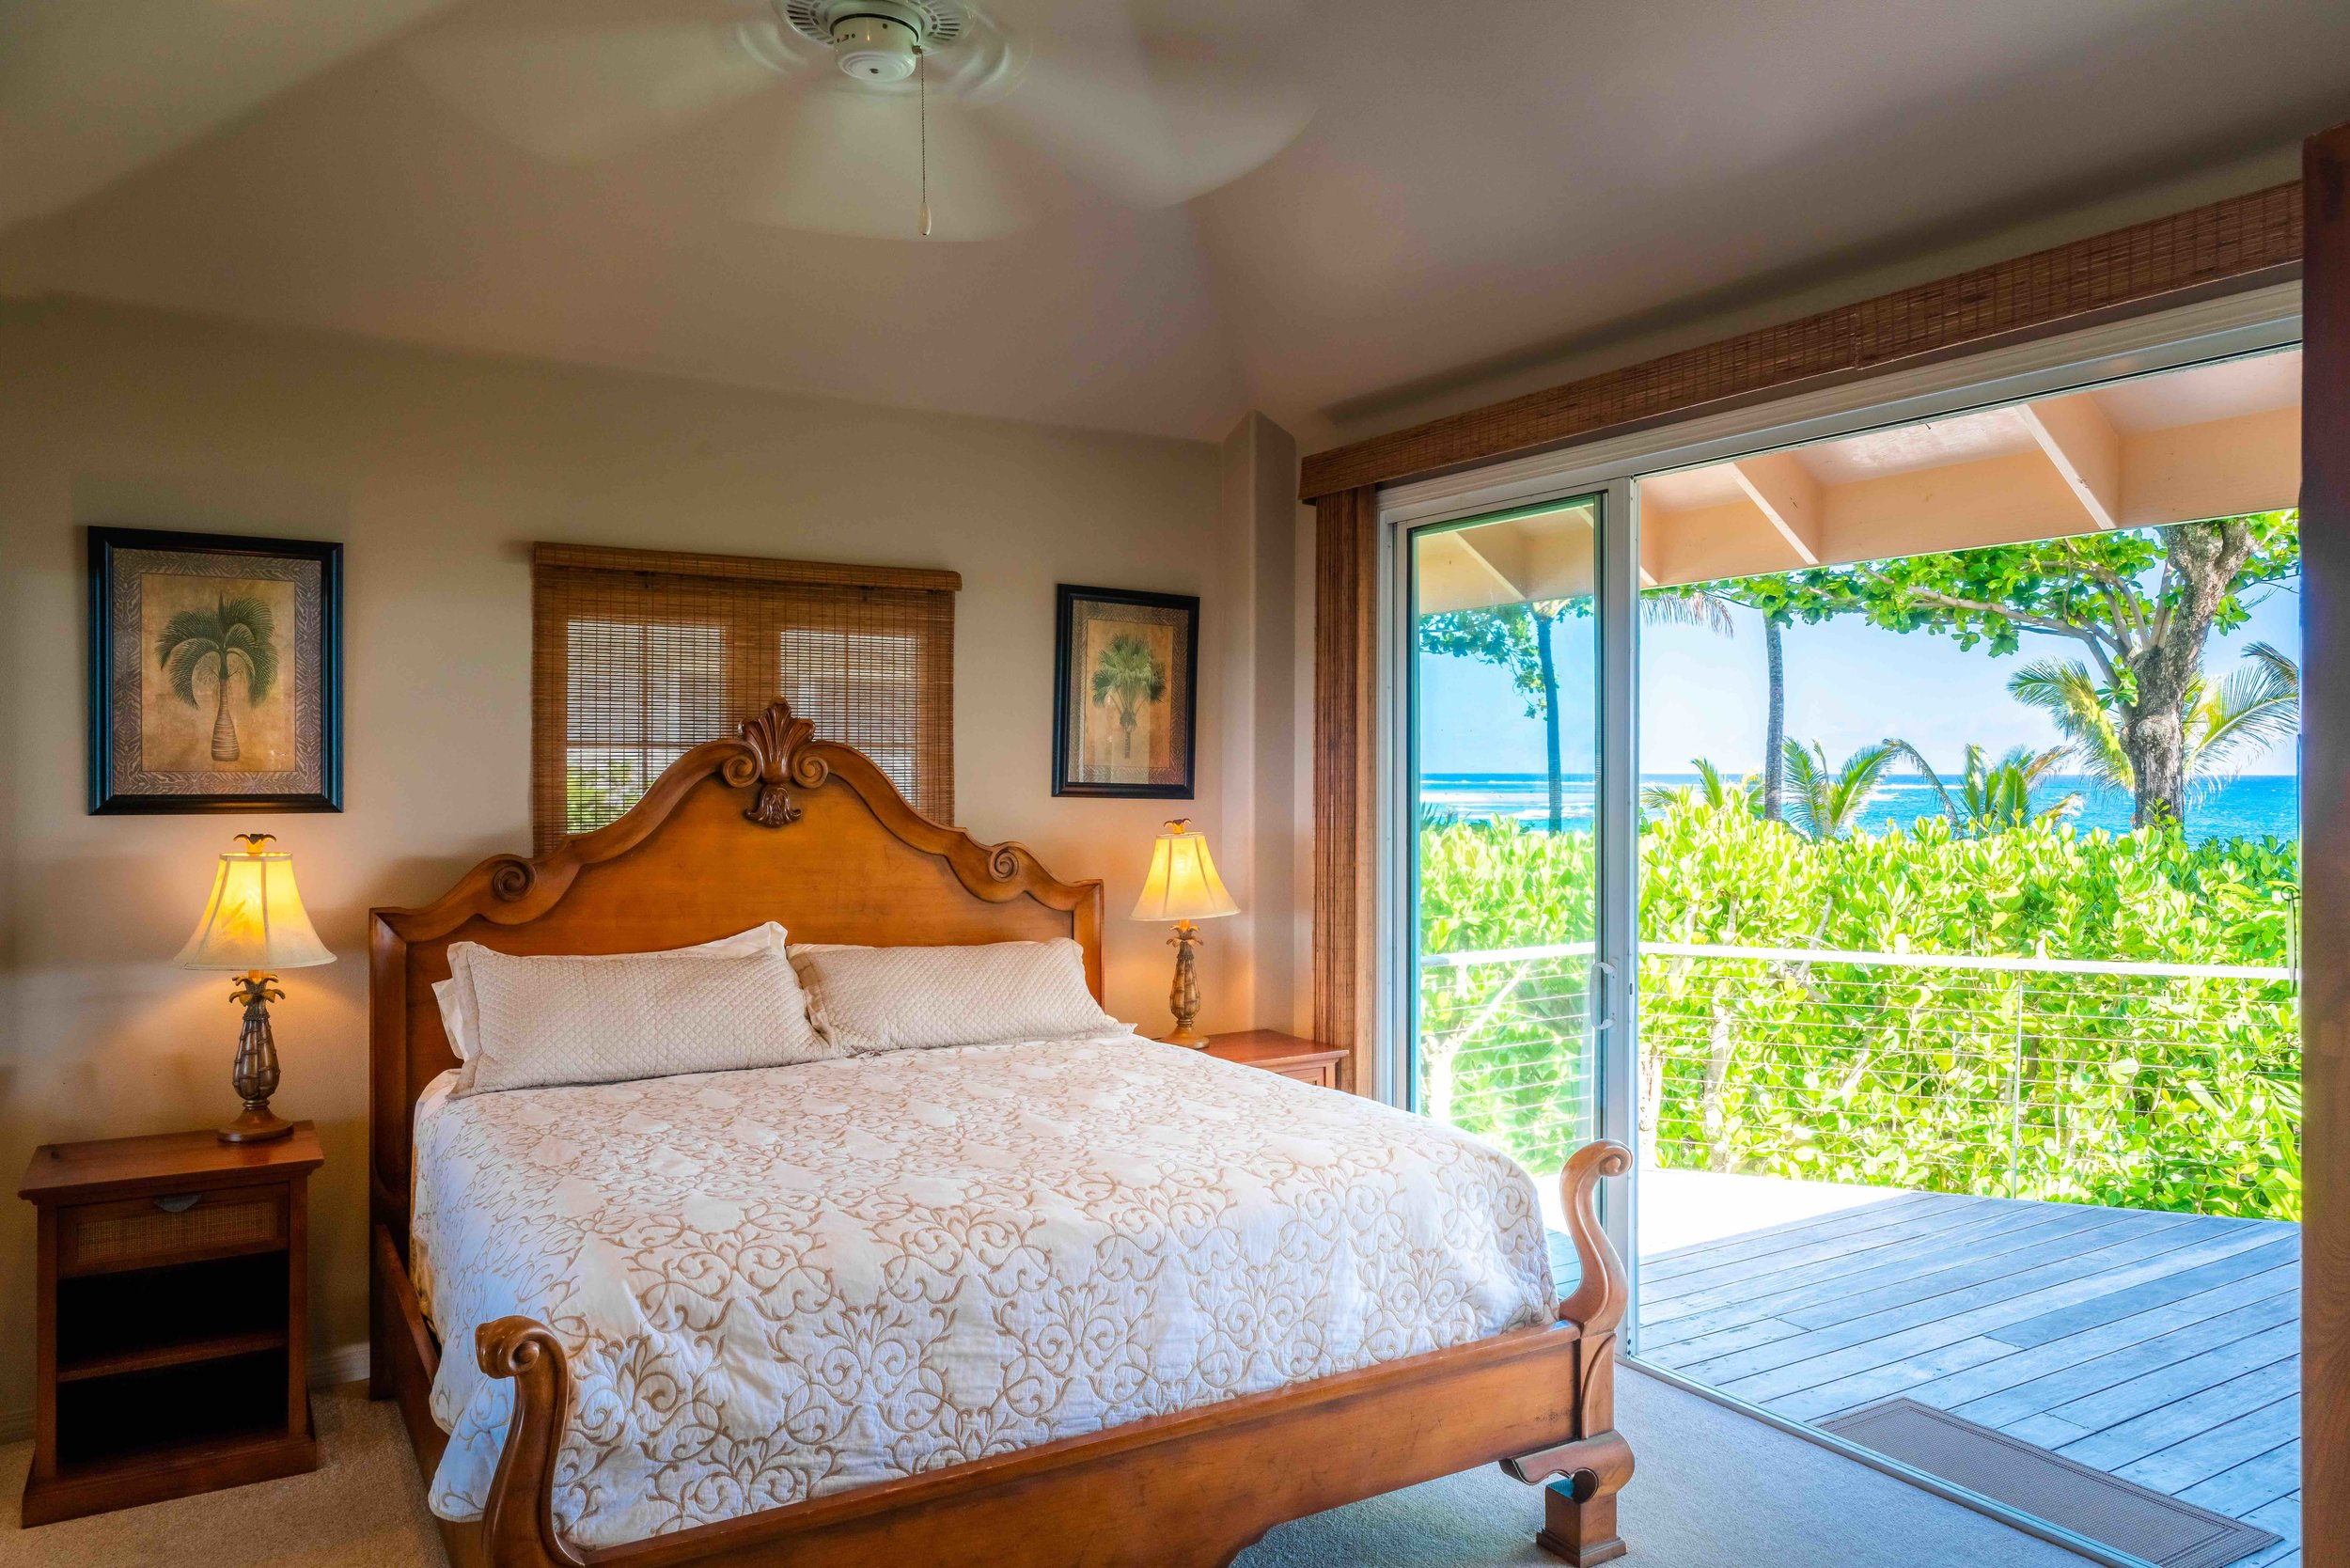 Luxury Vacation Rental Kauai